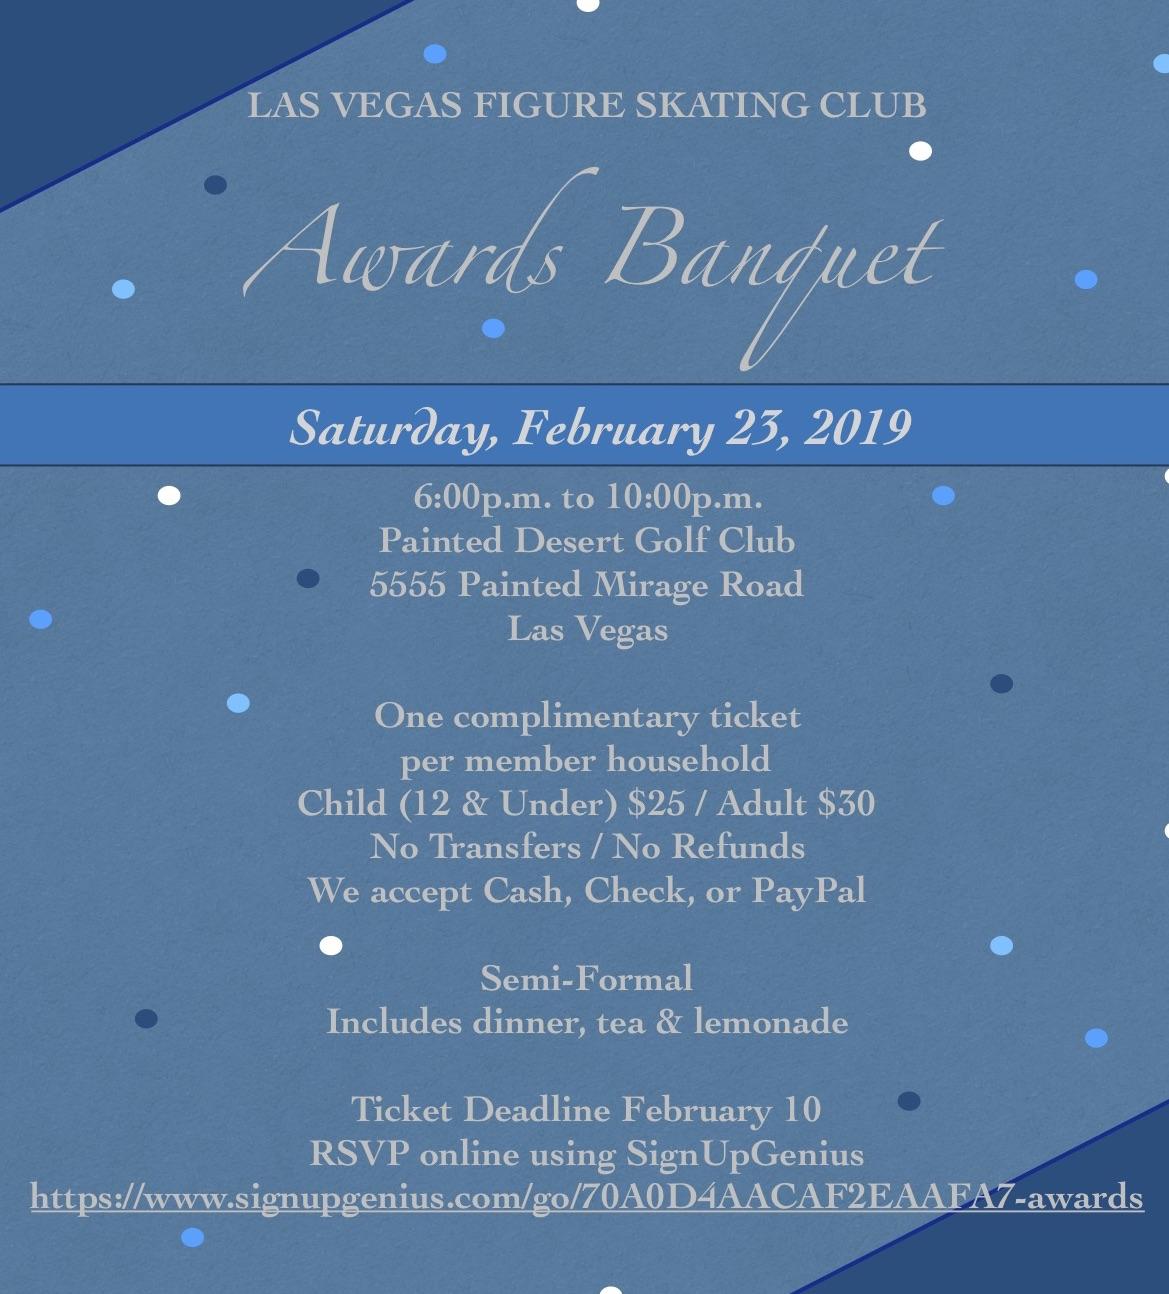 Las Vegas Calendar February 10 2019 2019 Annual Awards Banquet Dinner — Las Vegas Figure Skating Club